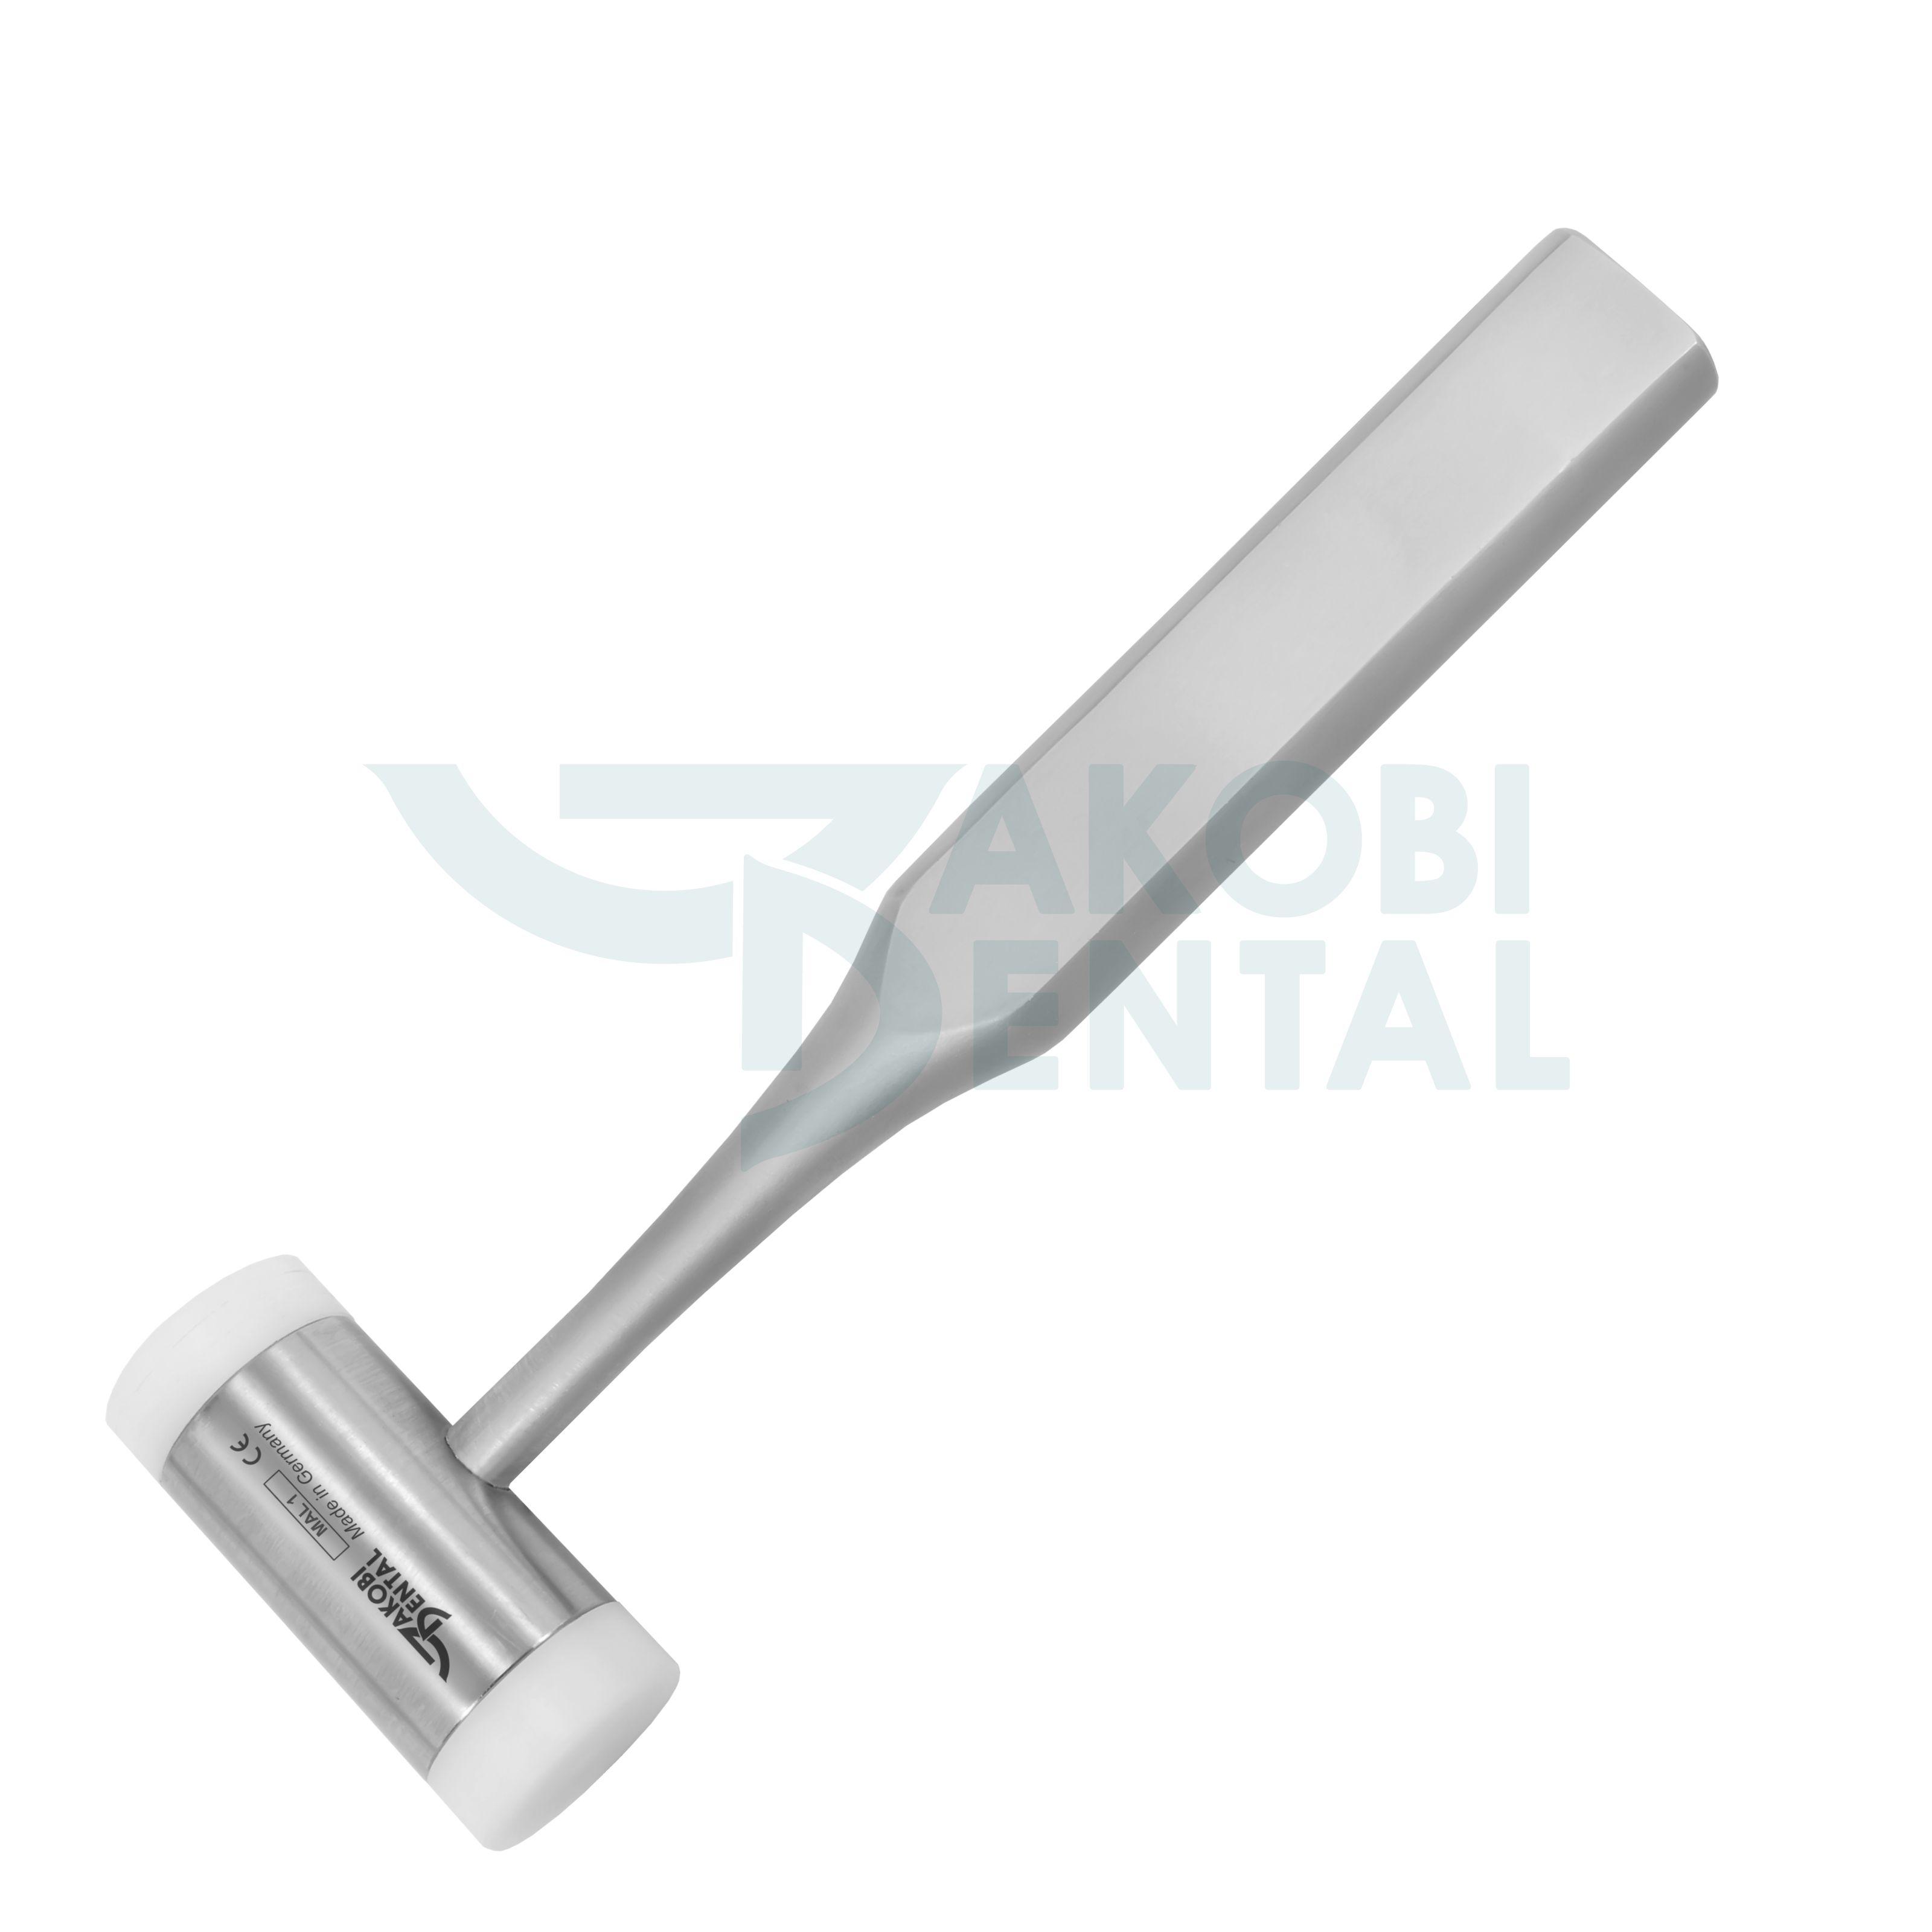 Surgical mallet MAL1, Nylon jaws, 200 gram